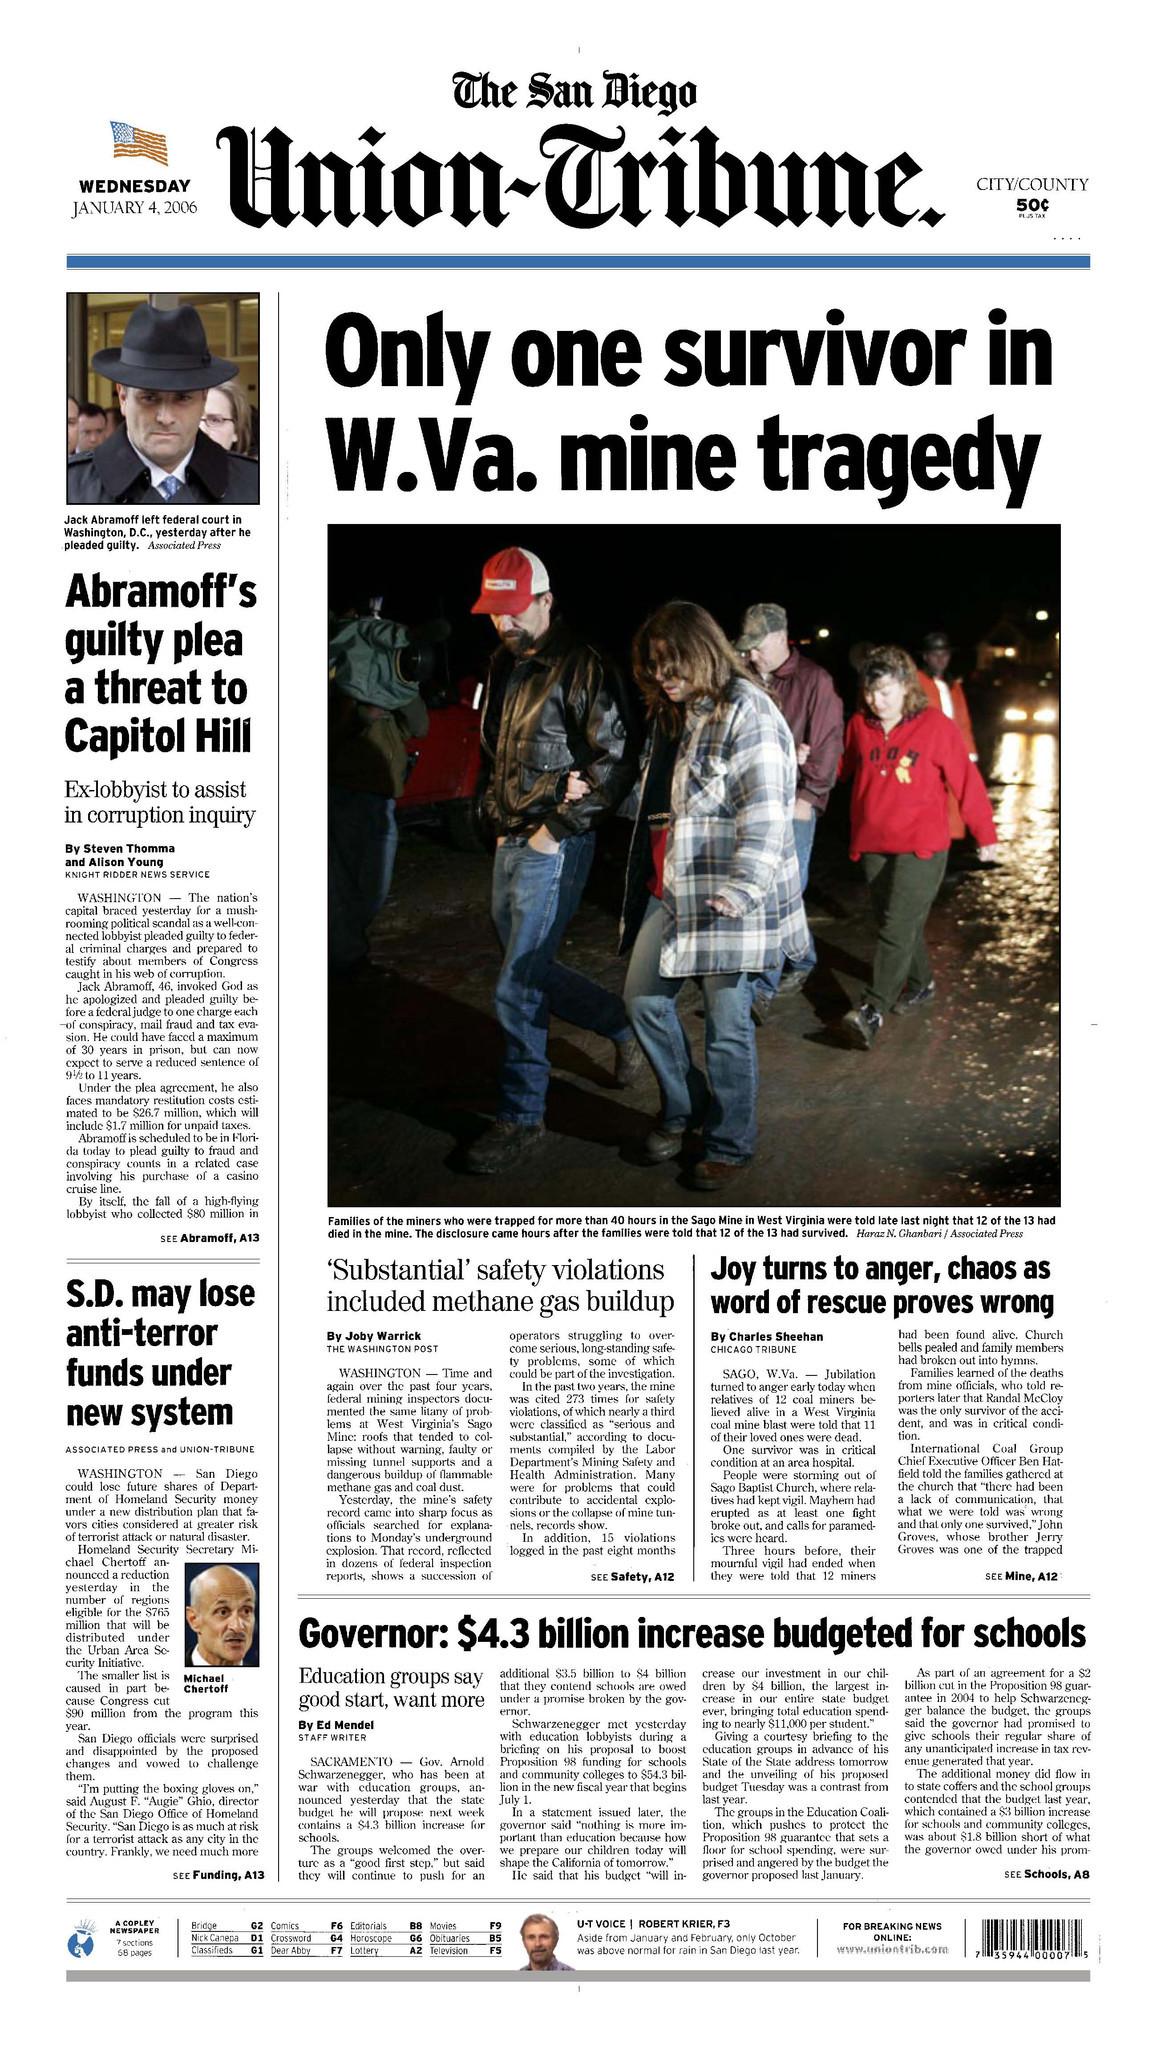 January 4, 2006: Only one survivor in W Va  mine tragedy